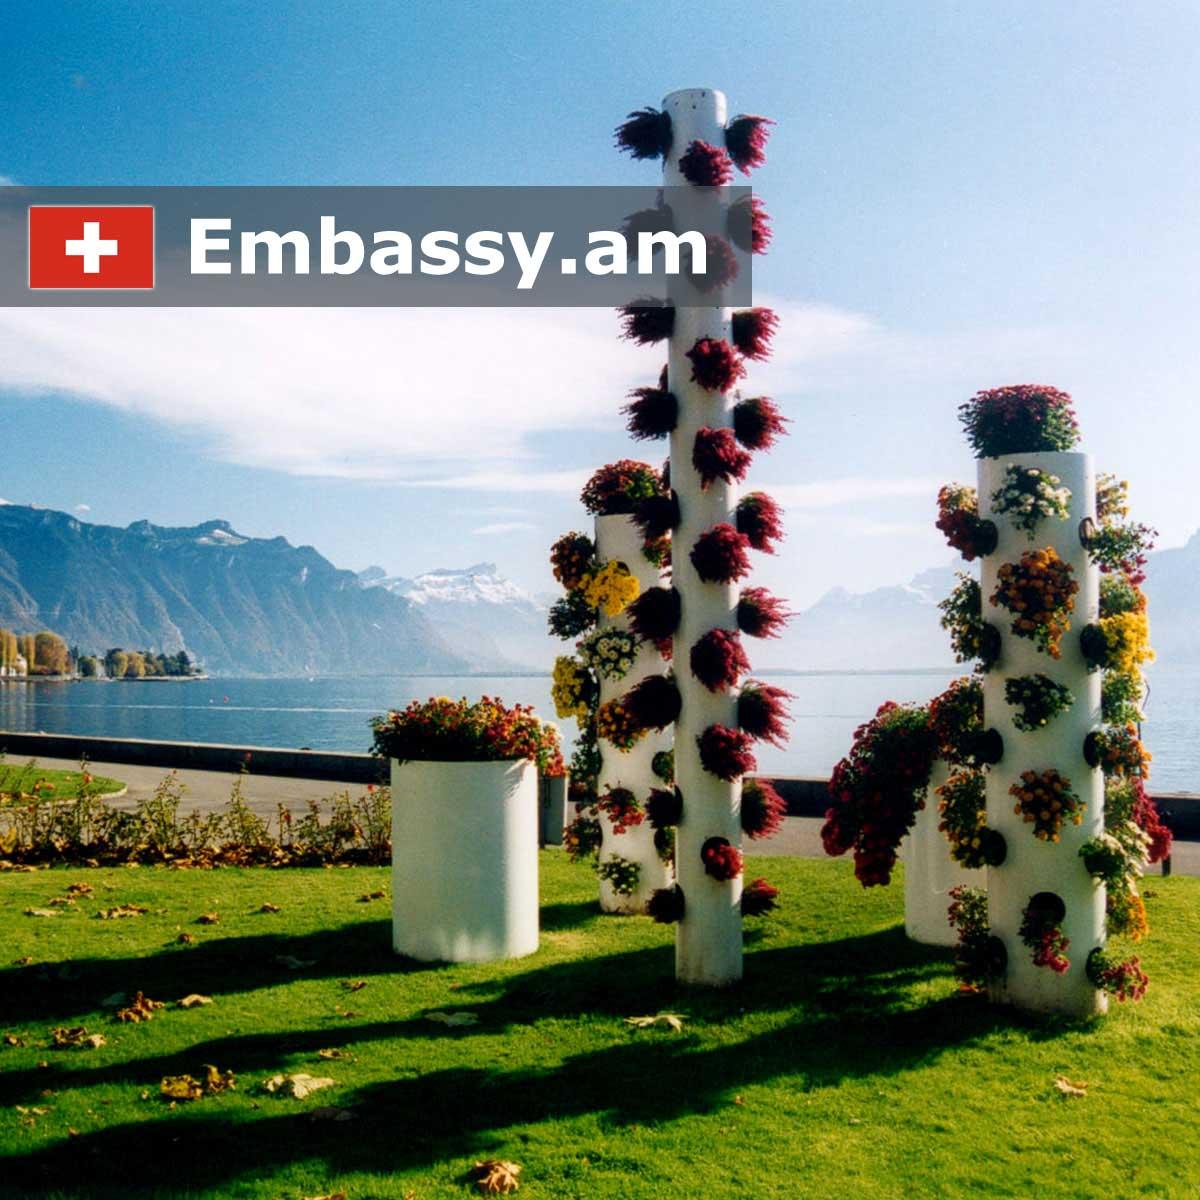 Lausanne - Hotels in Switzerland - Embassy.am